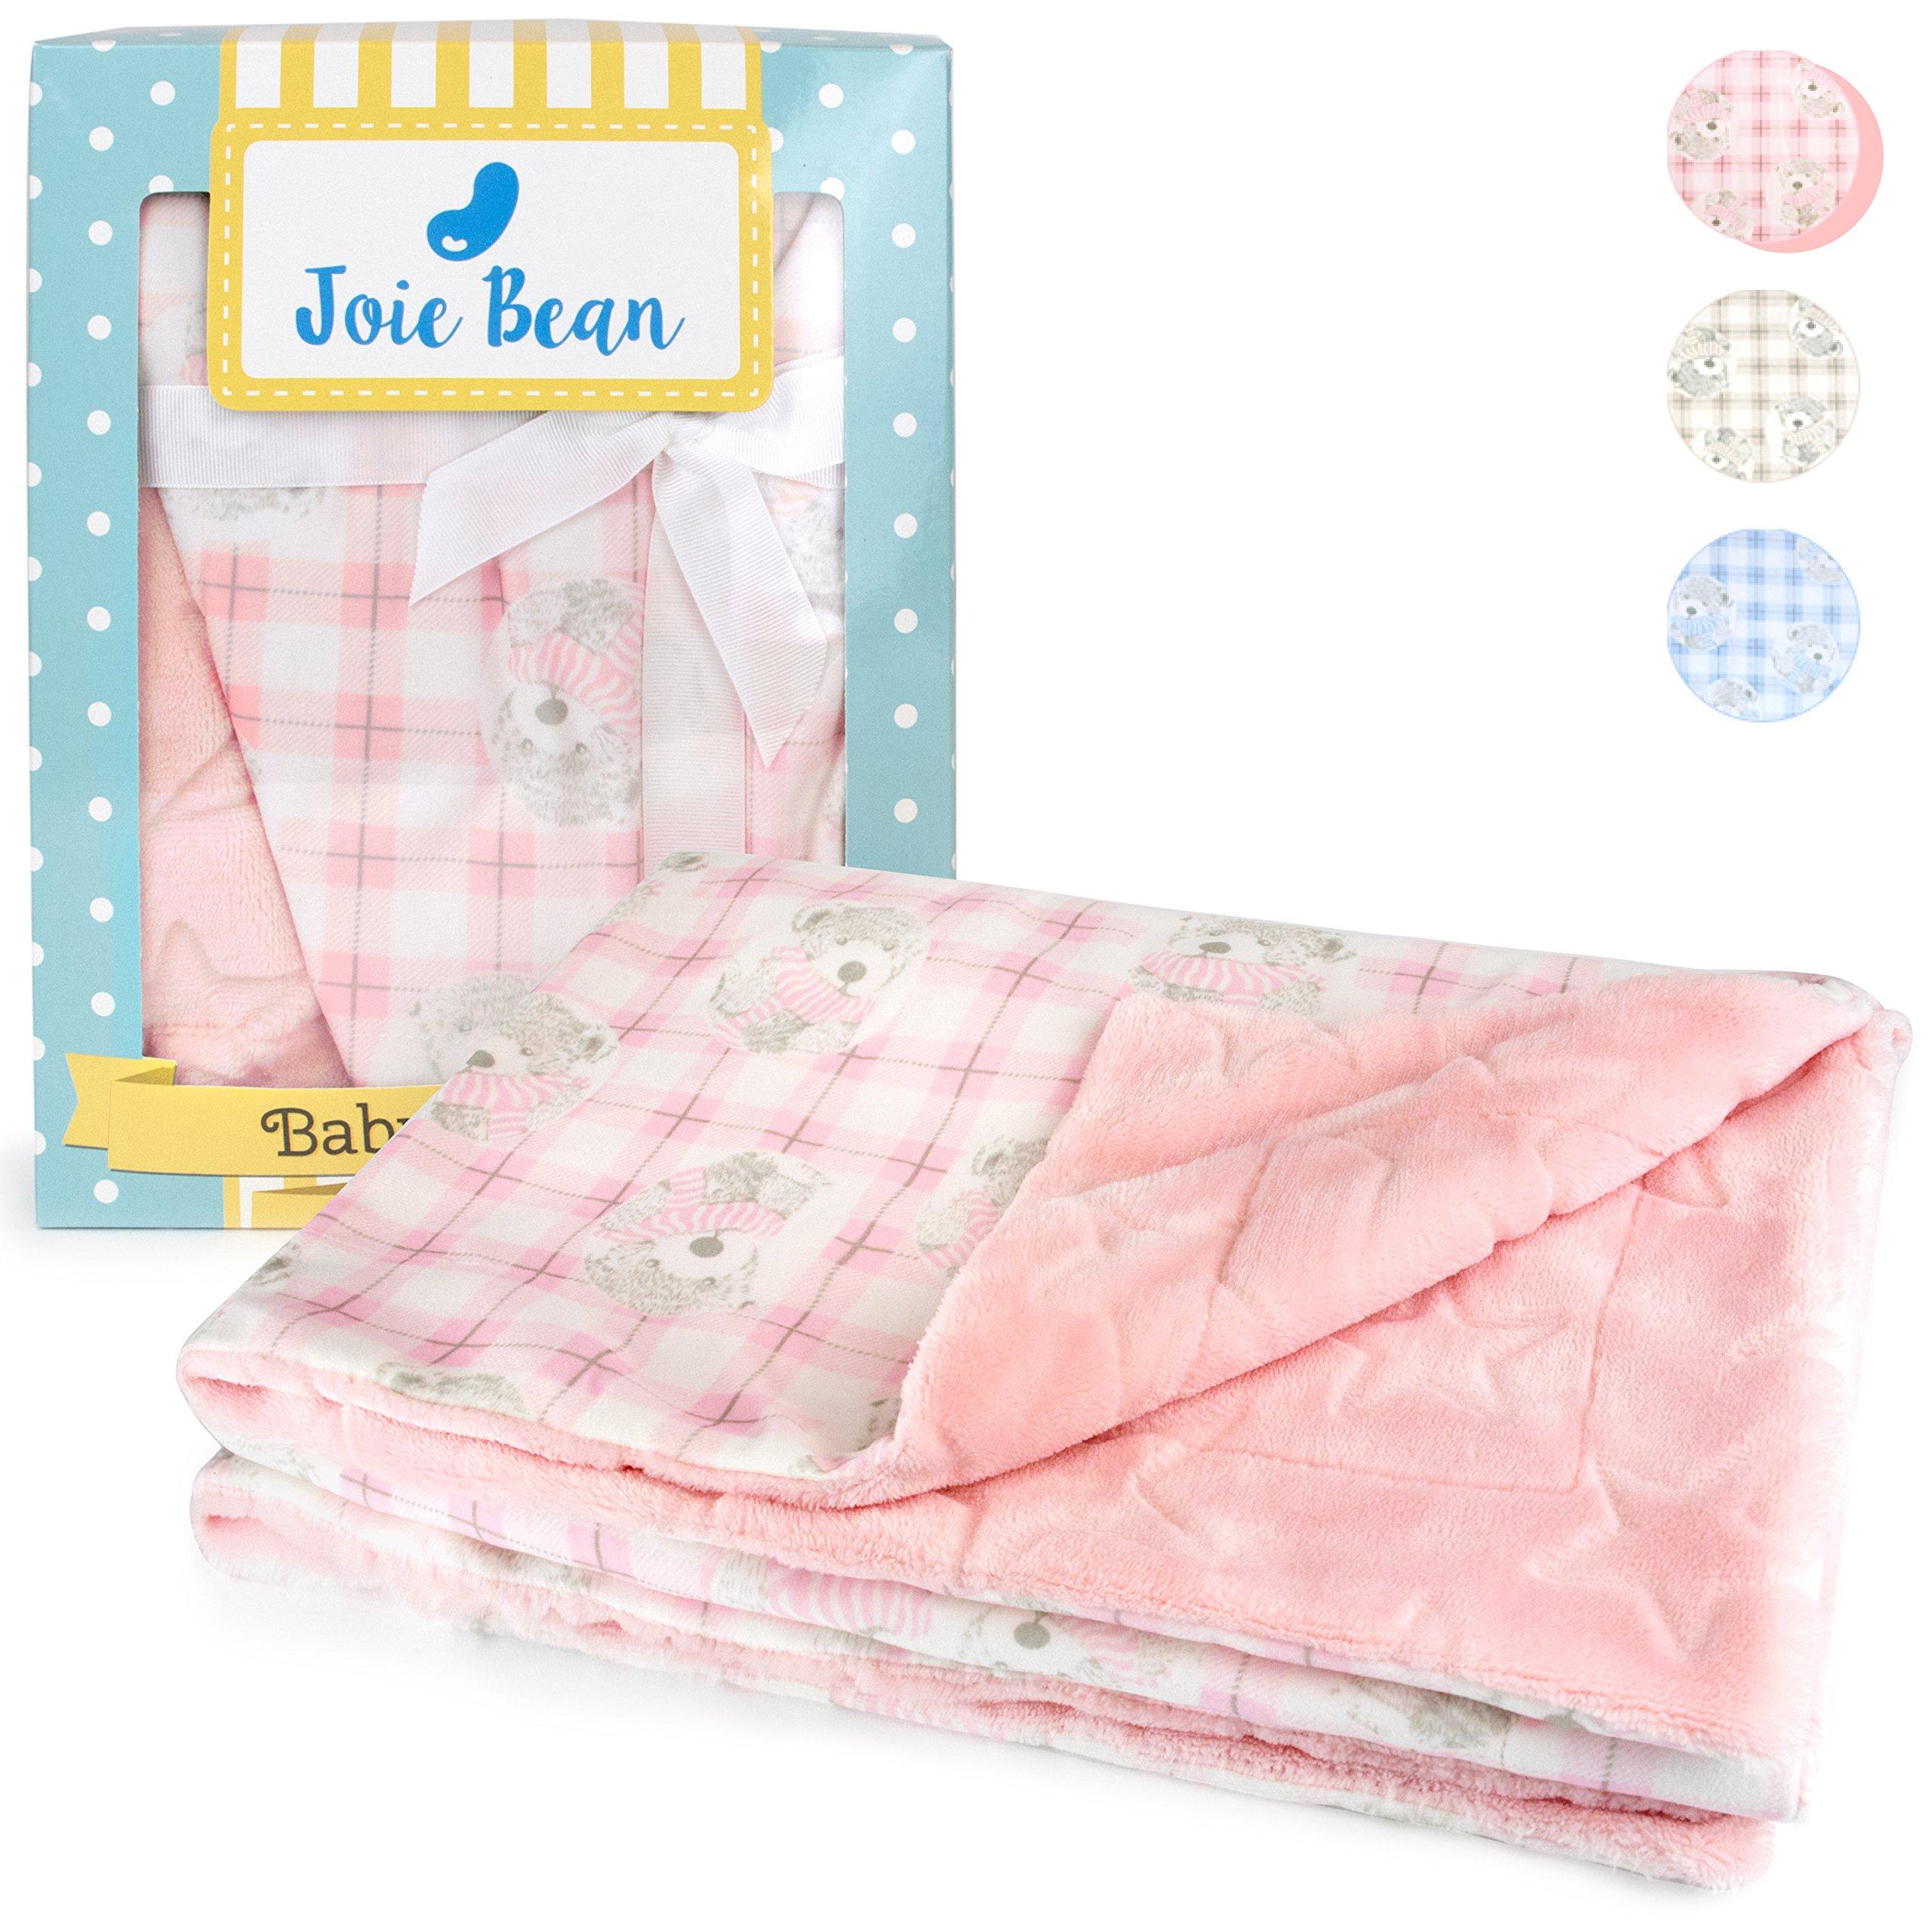 JOIE BEAN Plush Baby Blanket for Girls, Infant & Newborn | Fleece Soft Lightweight Pink Baby Blanket | Warm Reversible Toddler Blanket